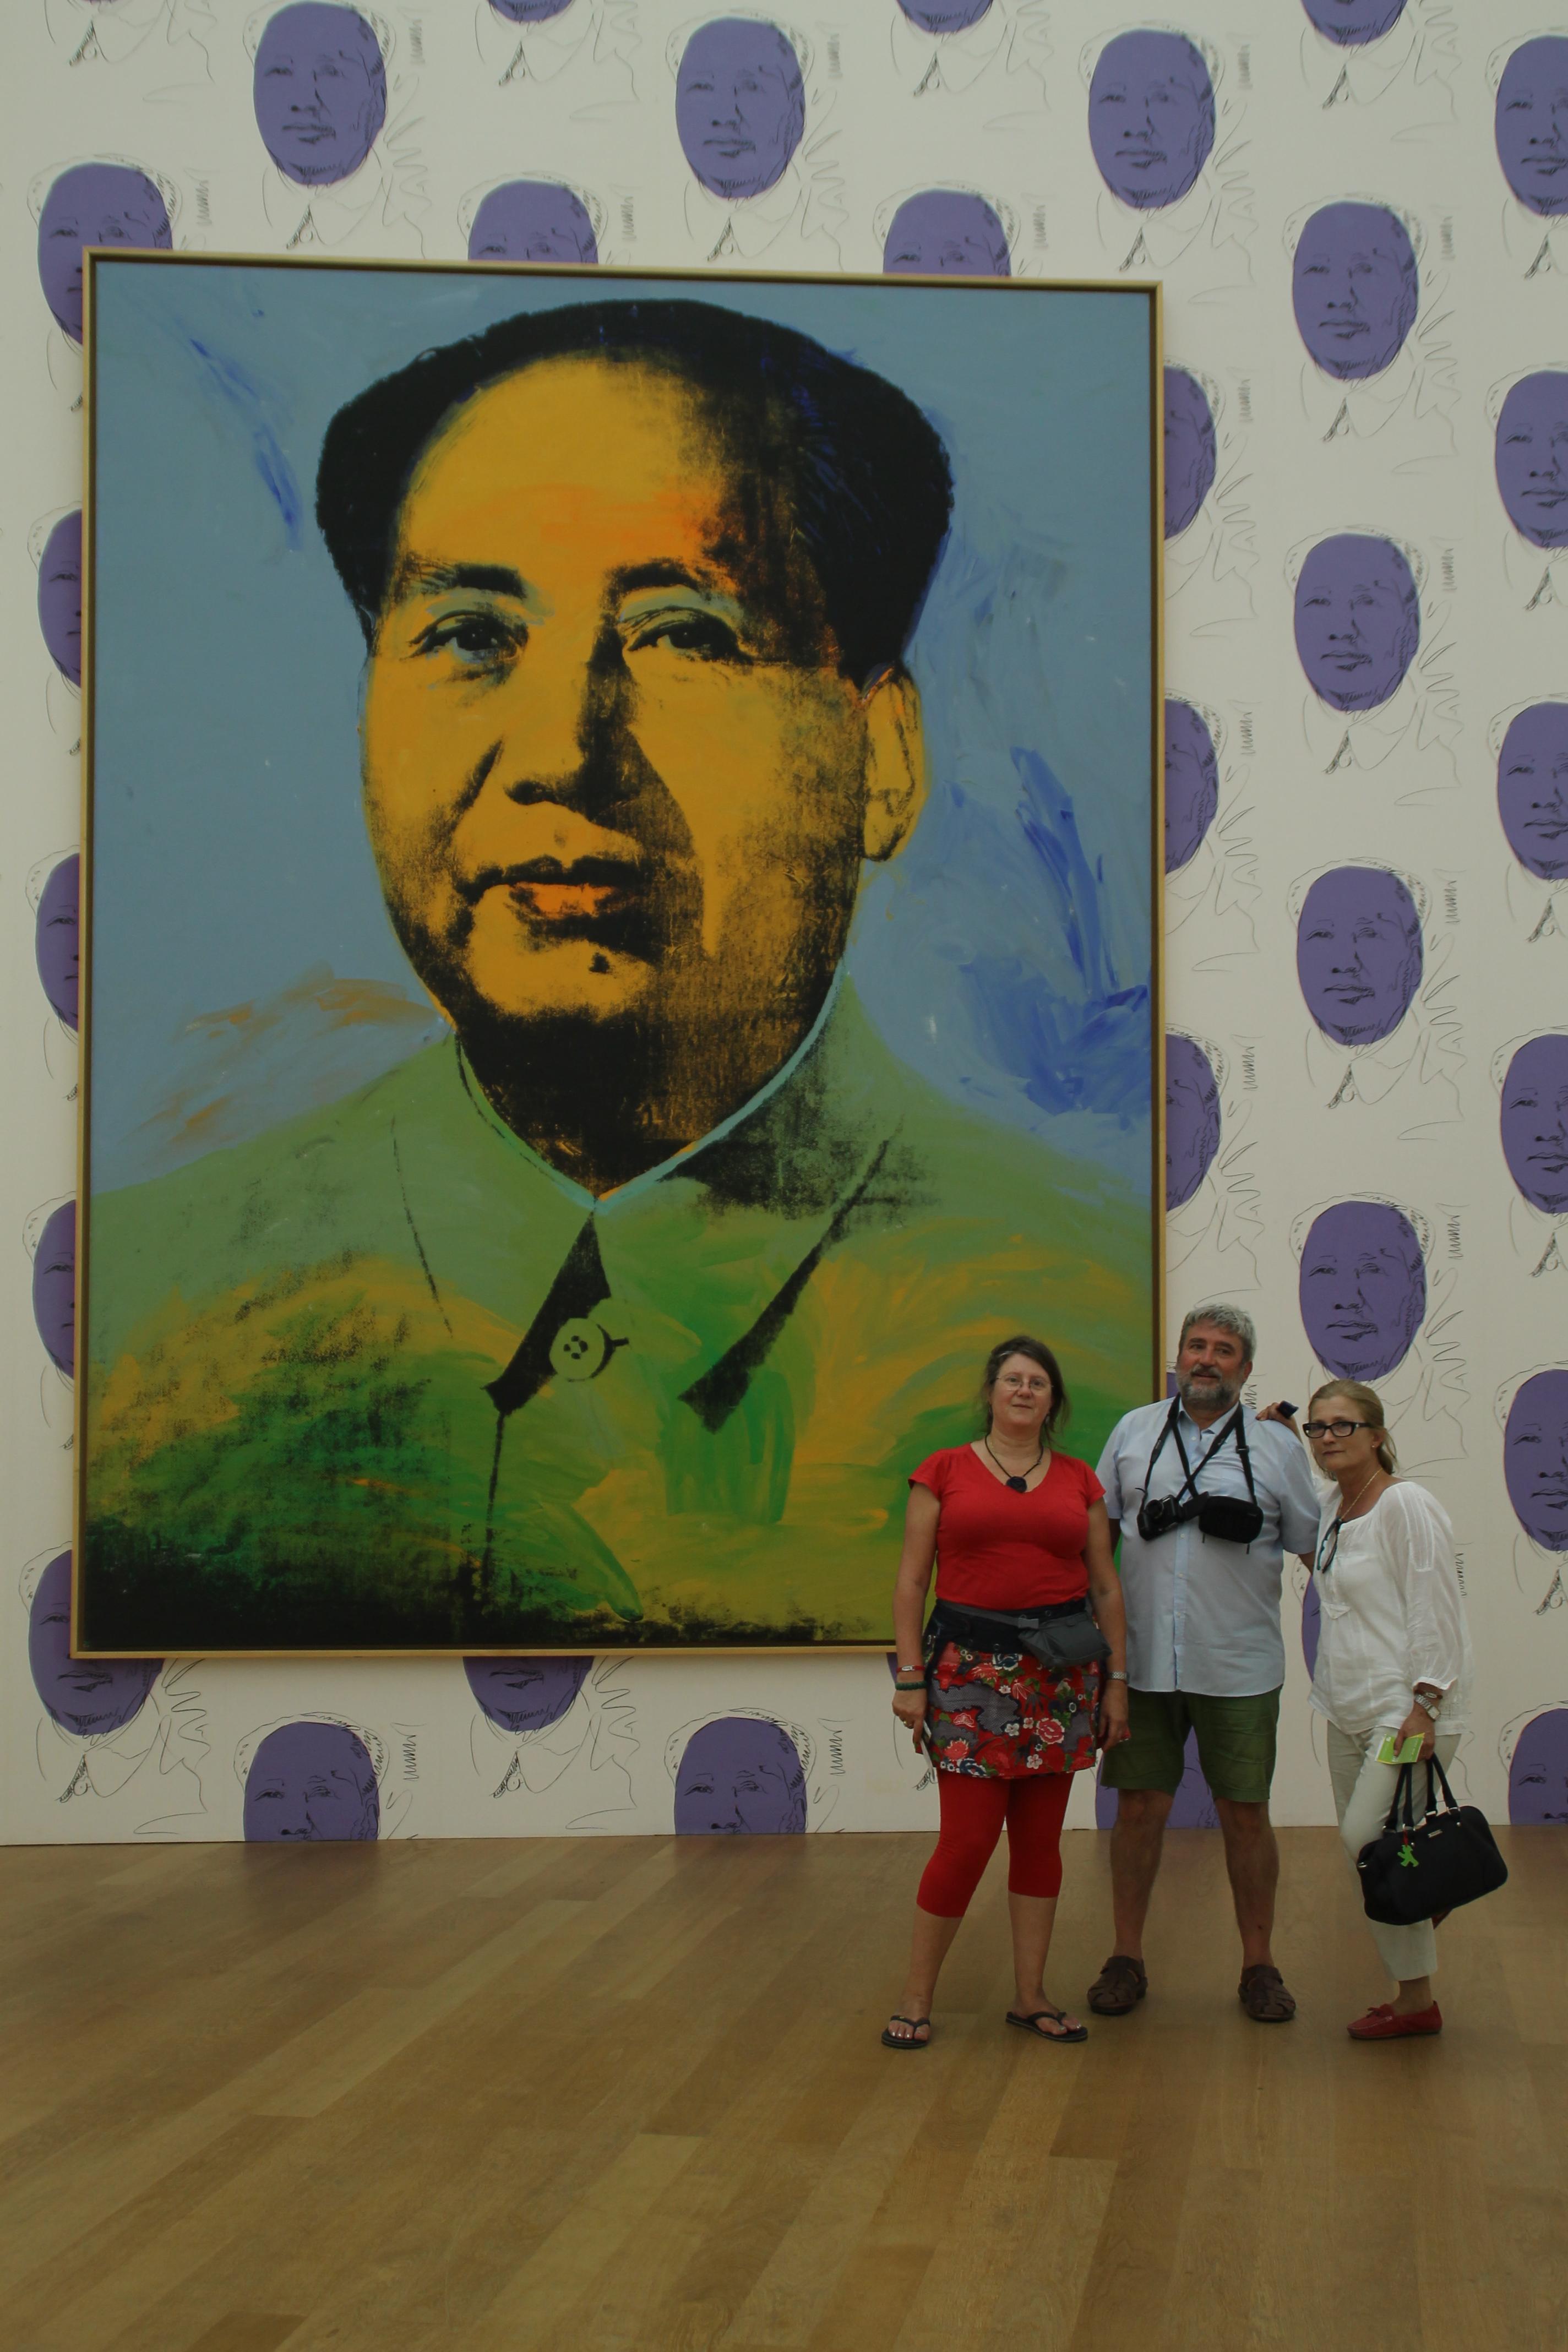 Mao per Warhol al  Hamburger Bahnhof.